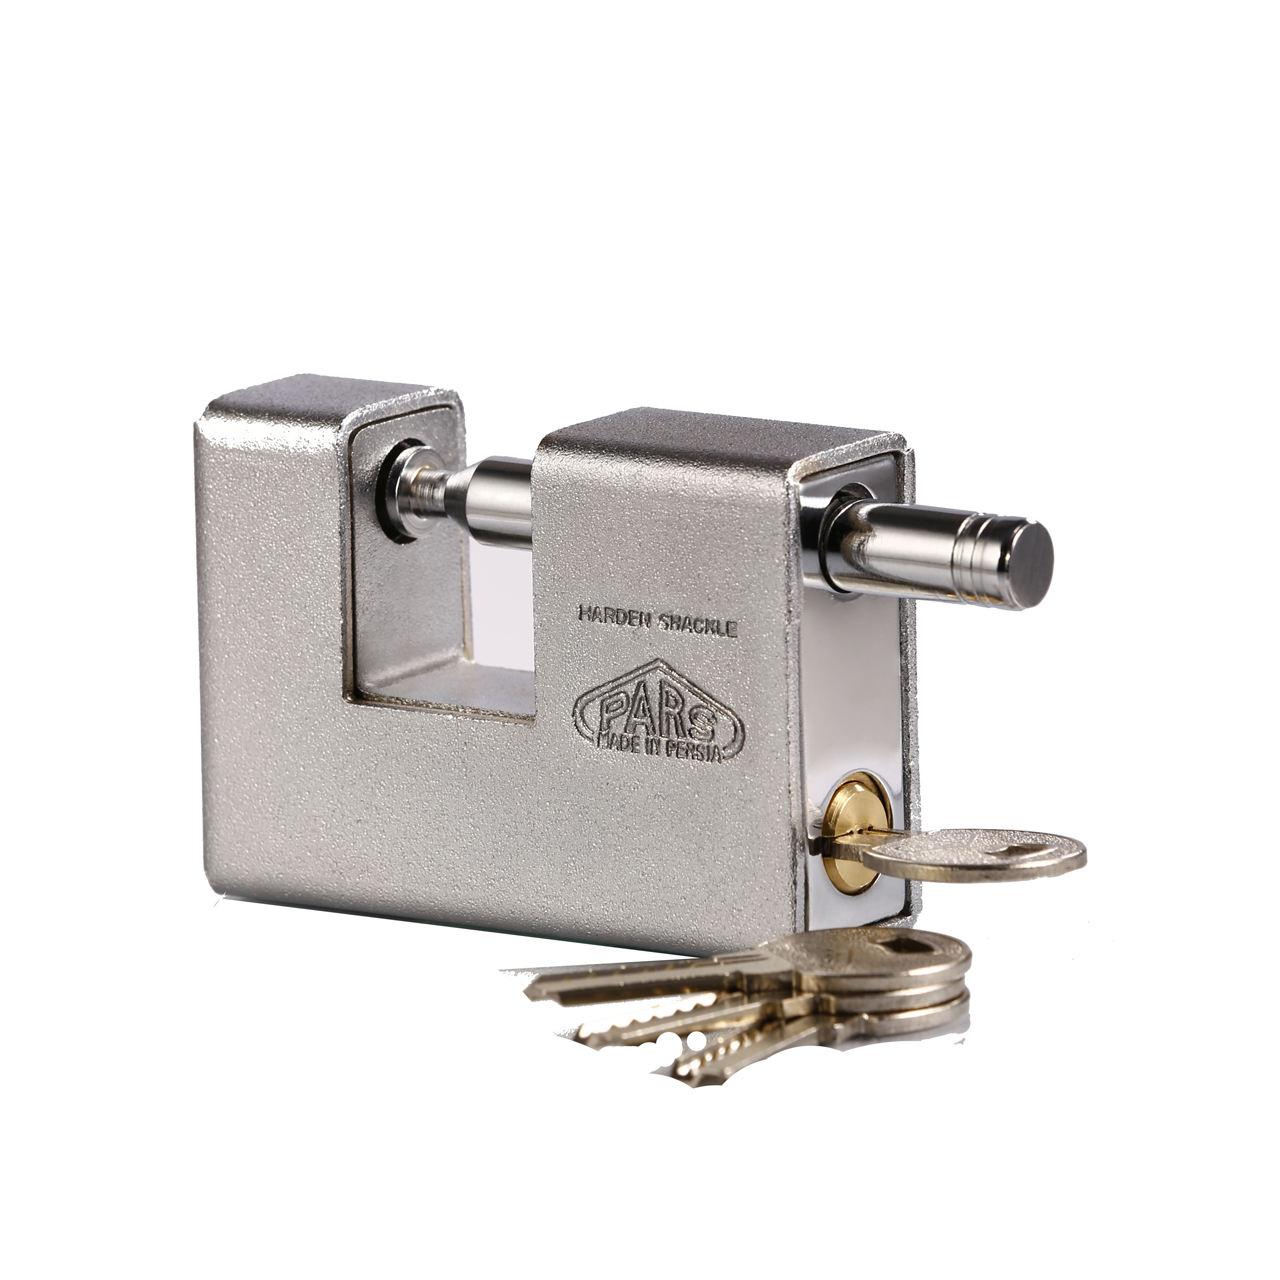 قفل کتابی پارس مدل 900SP